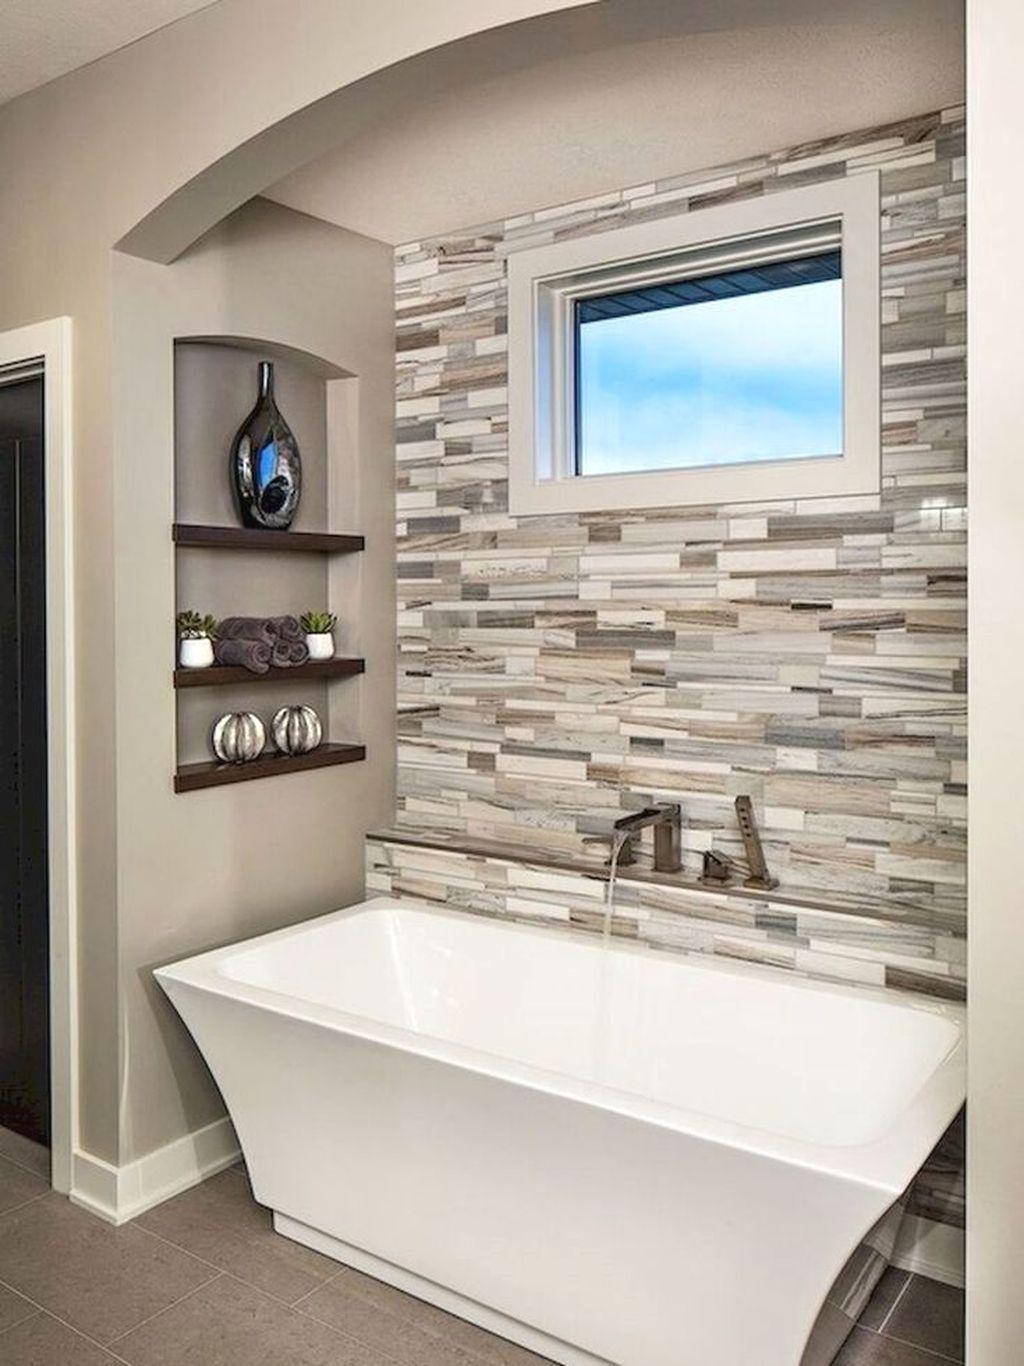 63 Relaxing Master Bathroom Bathtub Remodel Ideas | Master bathrooms ...